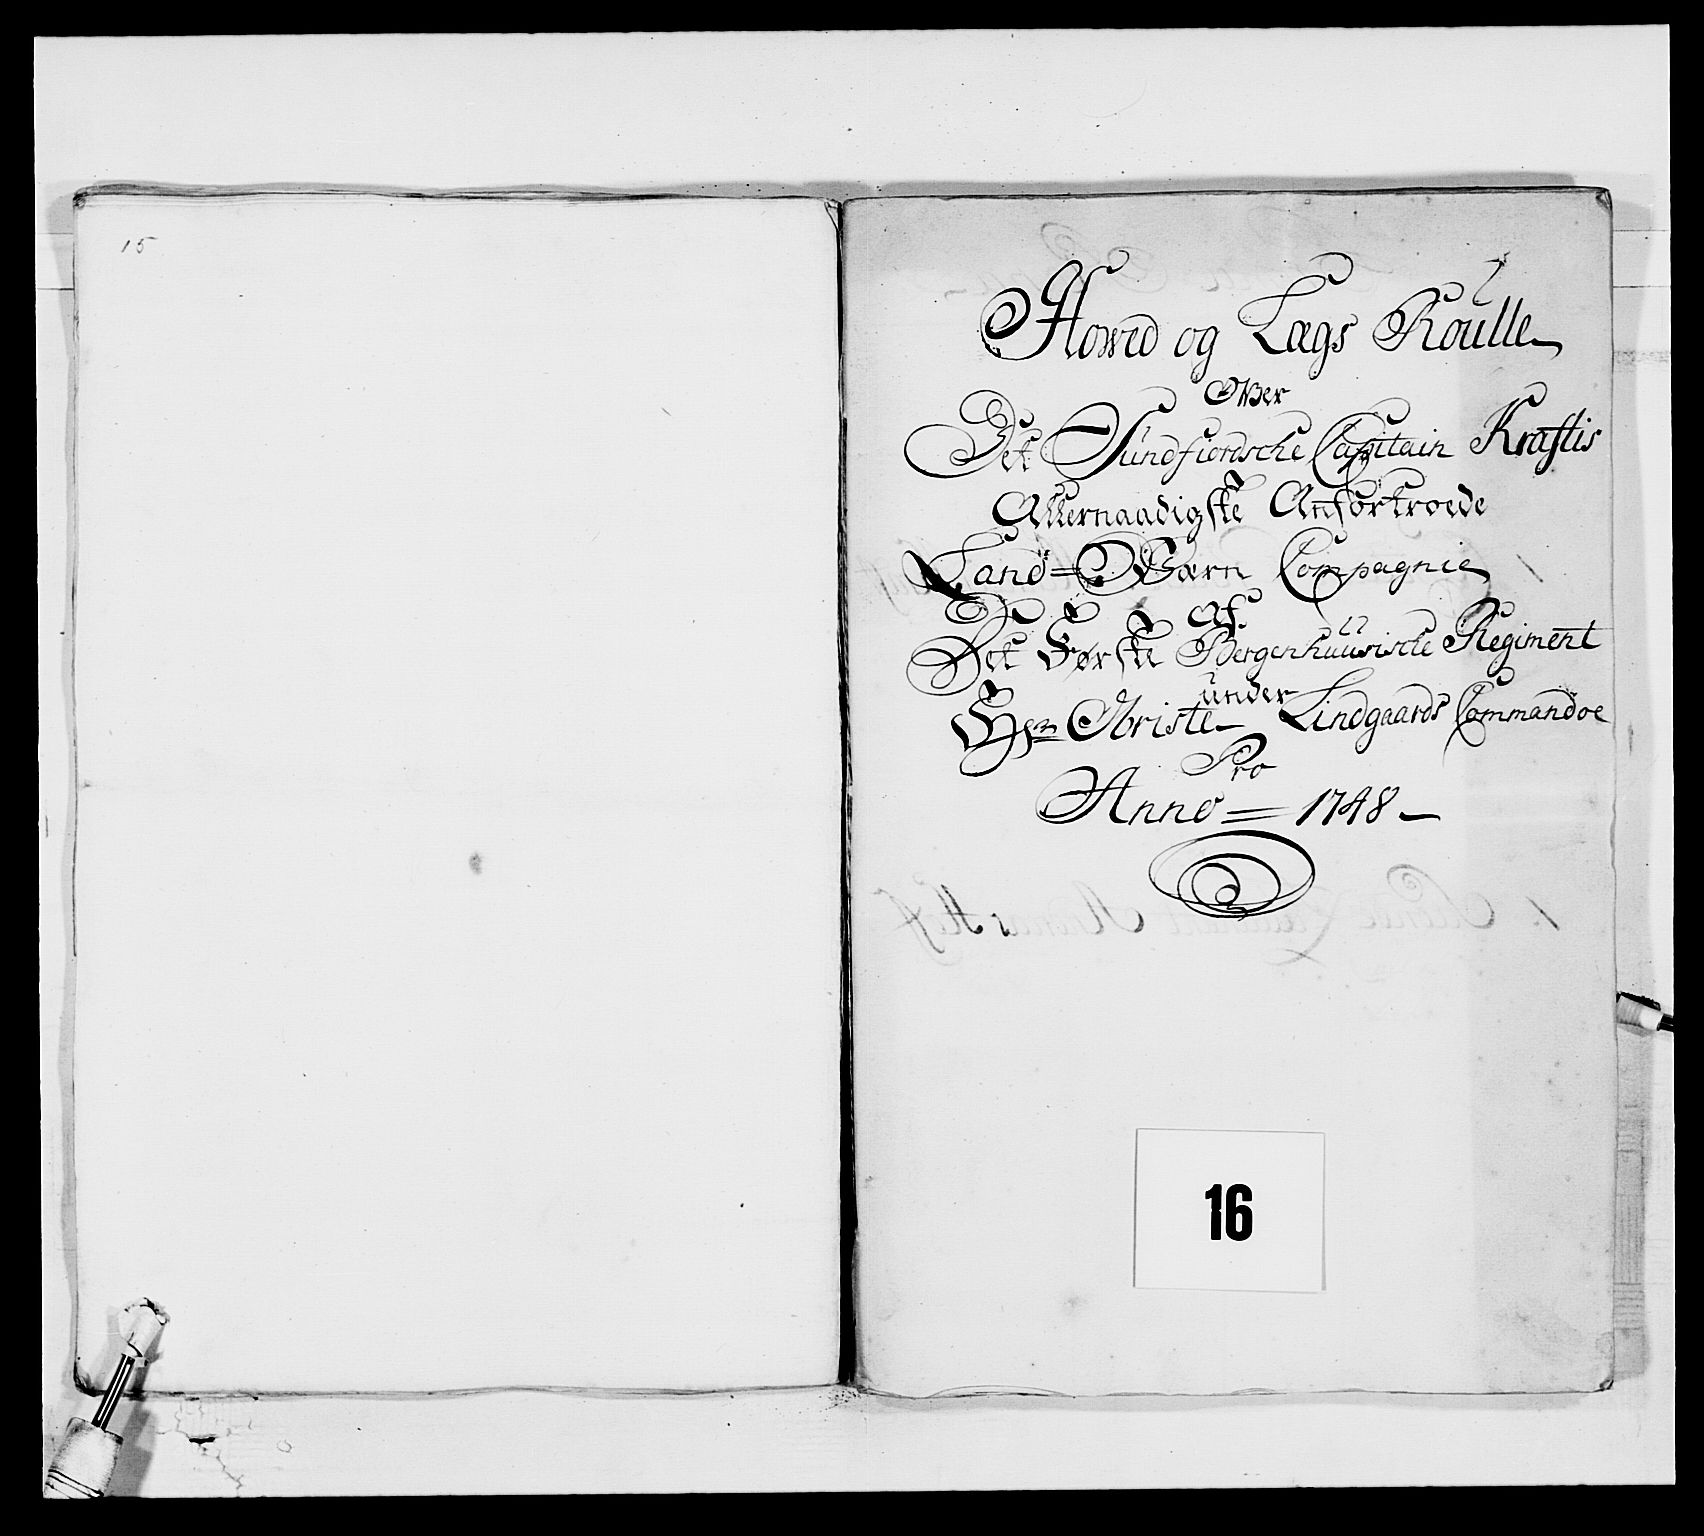 RA, Kommanderende general (KG I) med Det norske krigsdirektorium, E/Ea/L0517: 1. Bergenhusiske regiment, 1742-1756, s. 152